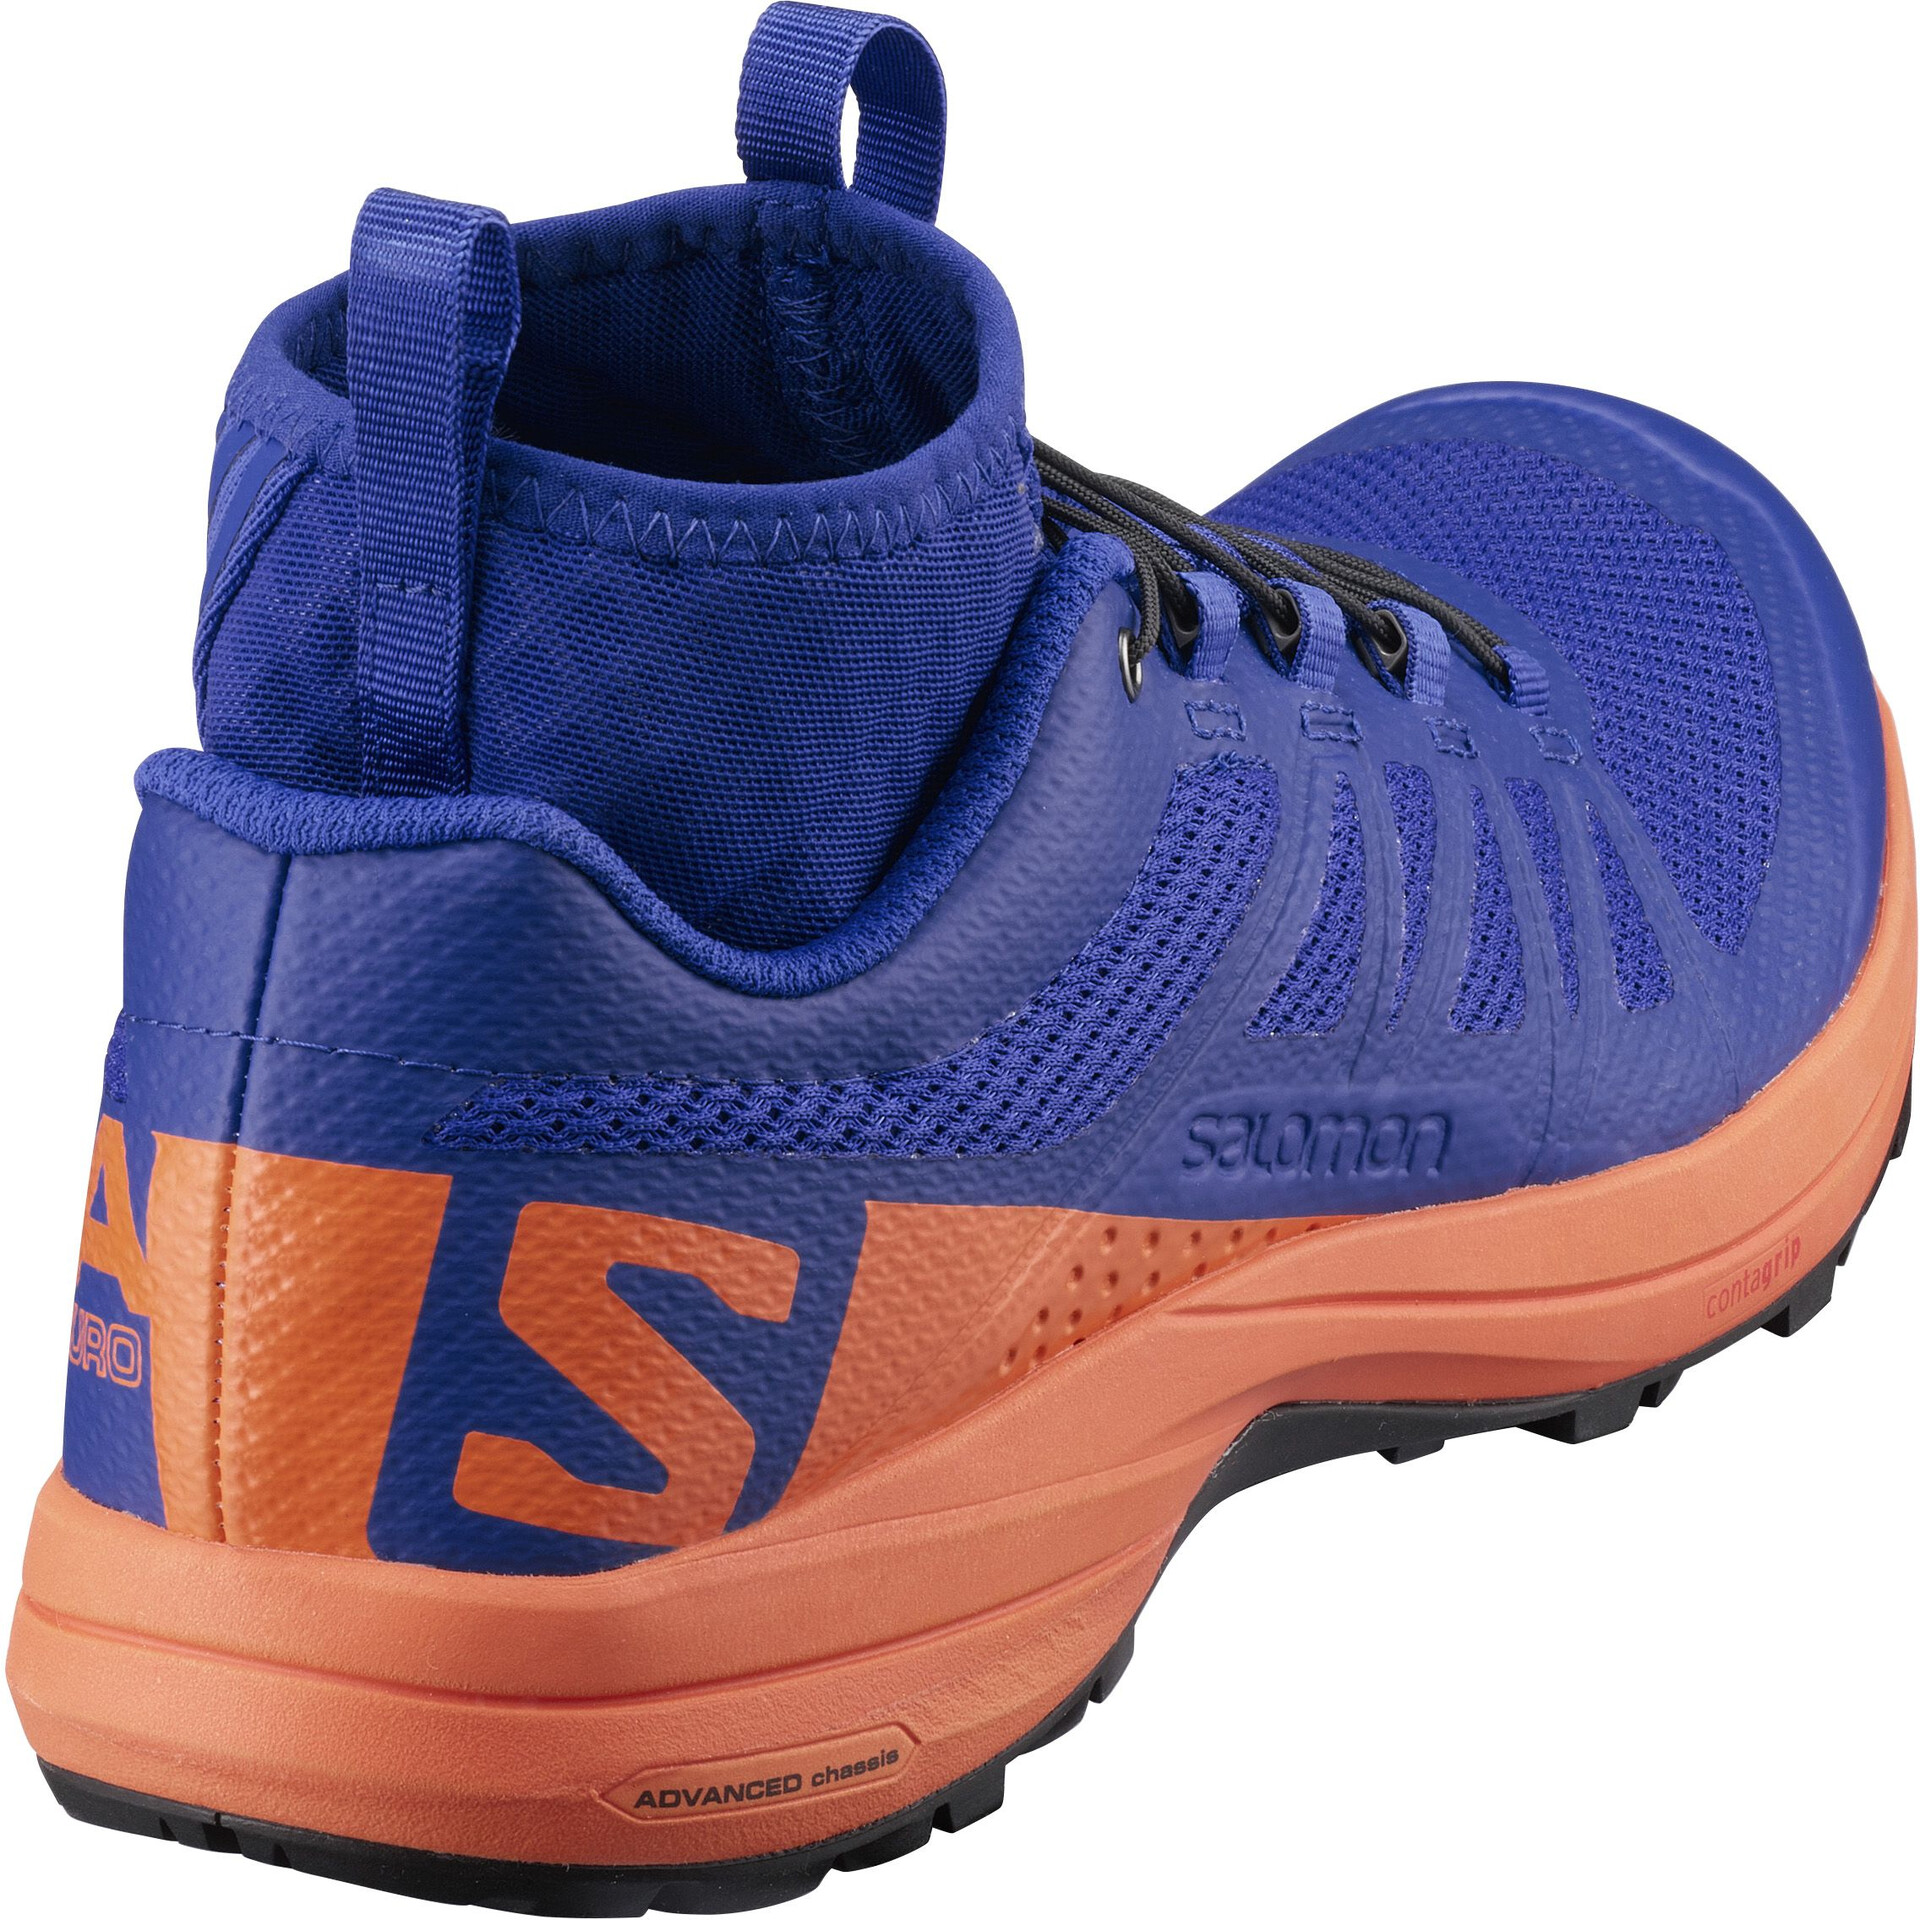 Campz Enduro Running Homme Orangebleu Salomon Chaussures Xa Sur A3j5RL4